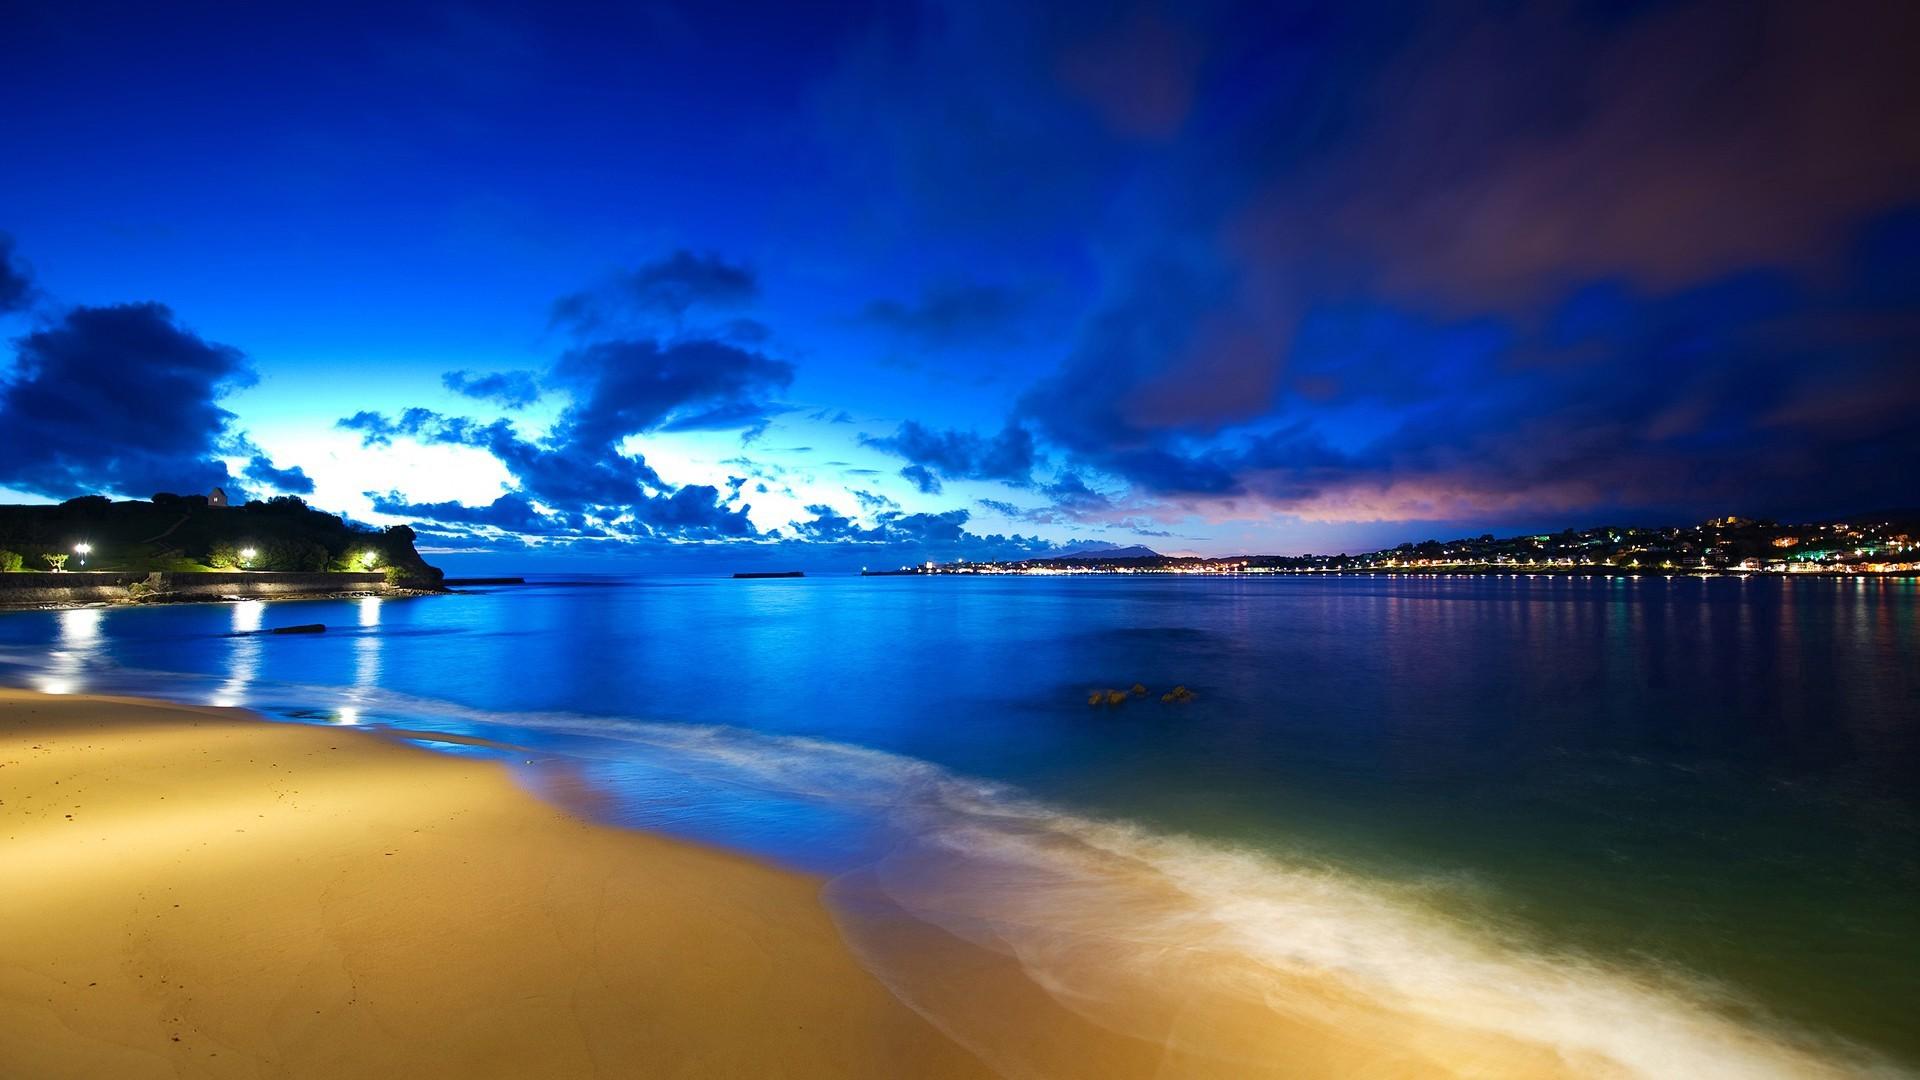 Ocean HD desktop wallpaper : Widescreen : Fullscreen : Mobile … |  Download Wallpaper | Pinterest | Hd desktop and Wallpaper